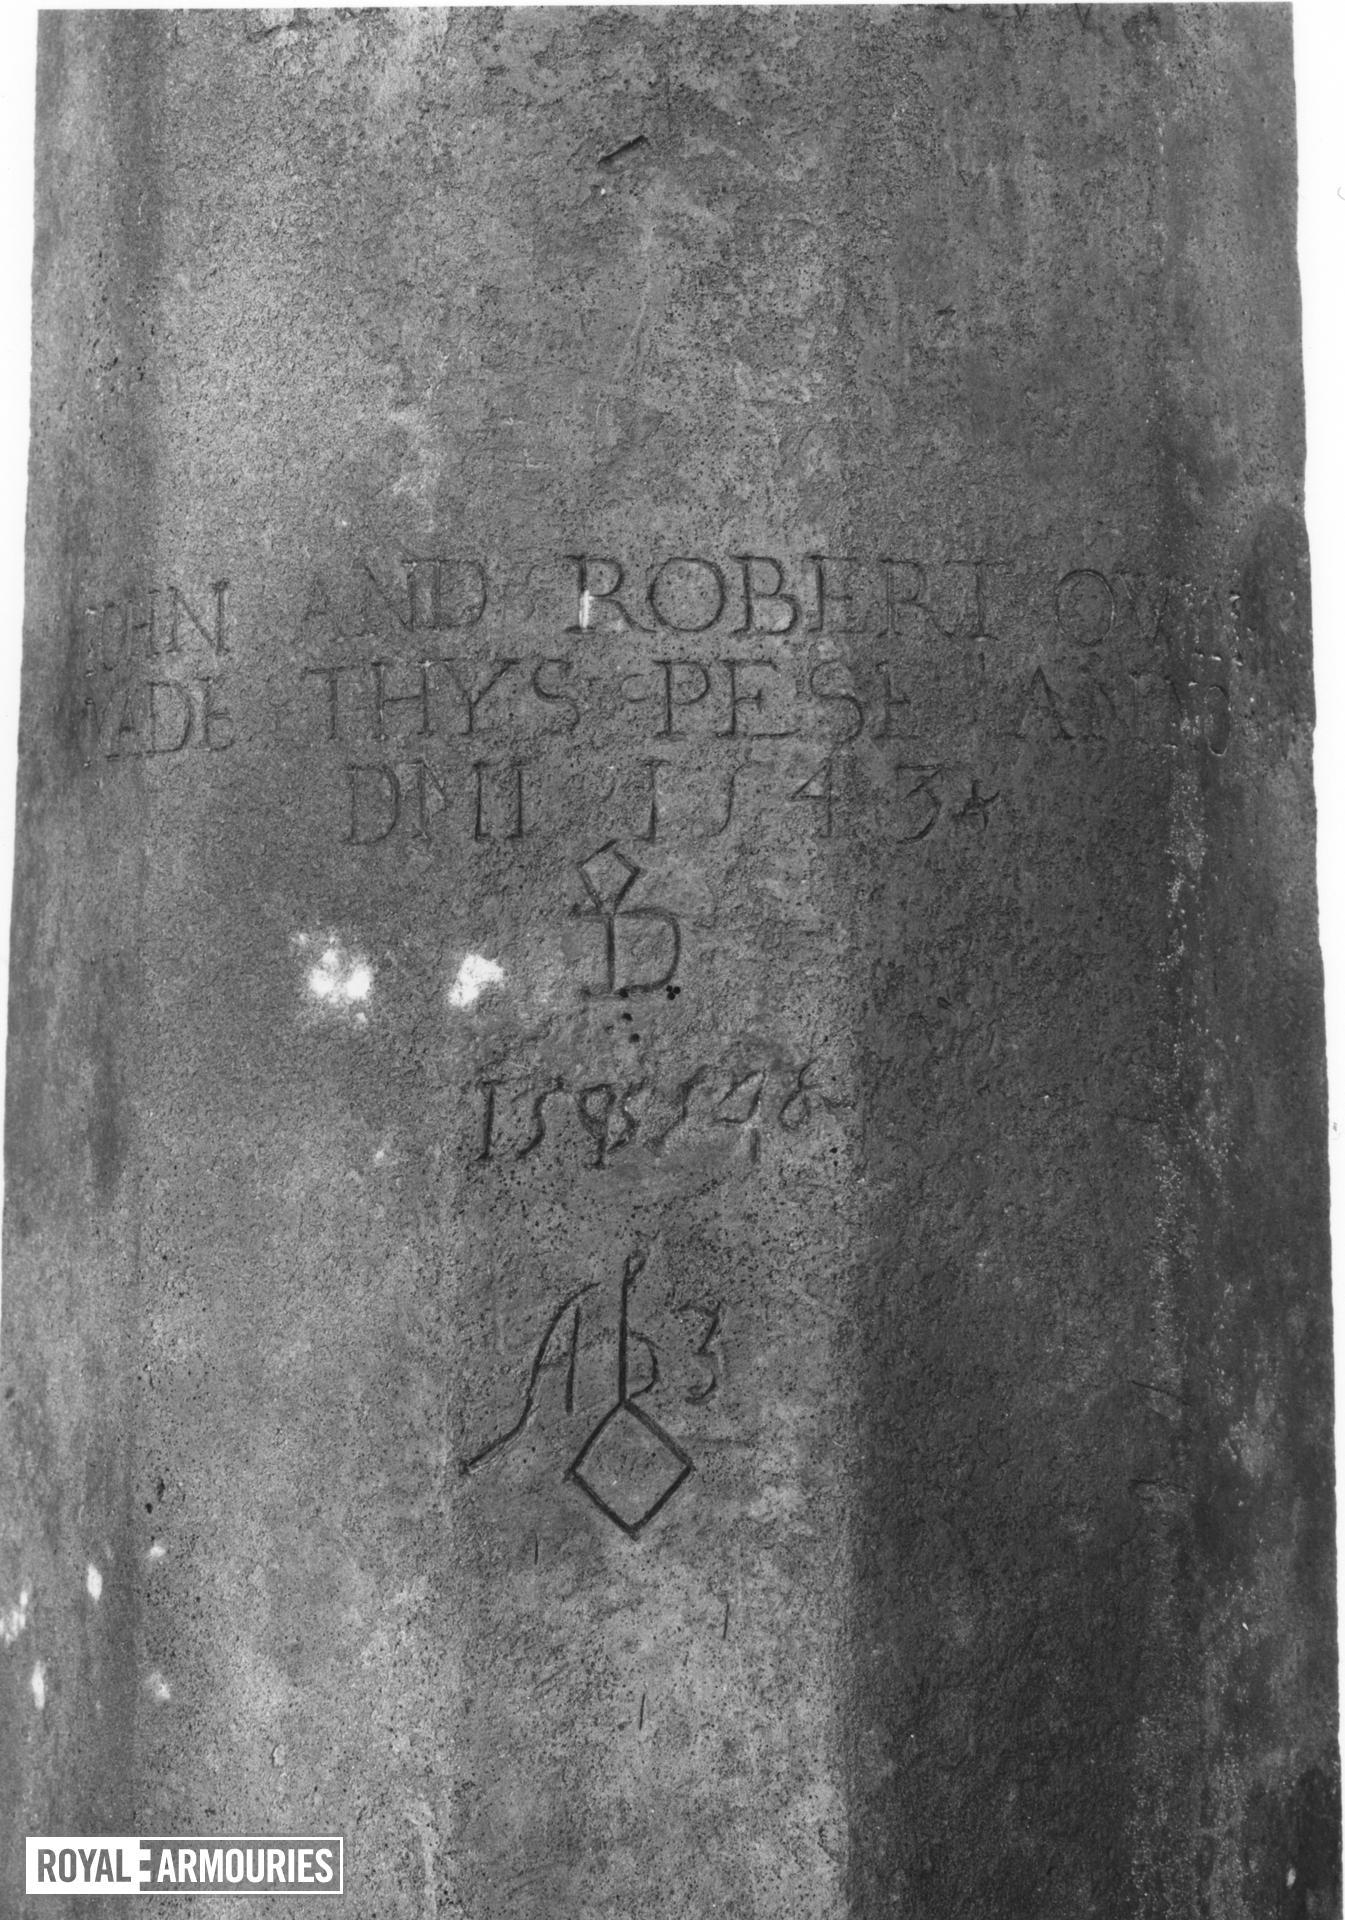 3.7 in saker Made of bronze By John and Robert Owen